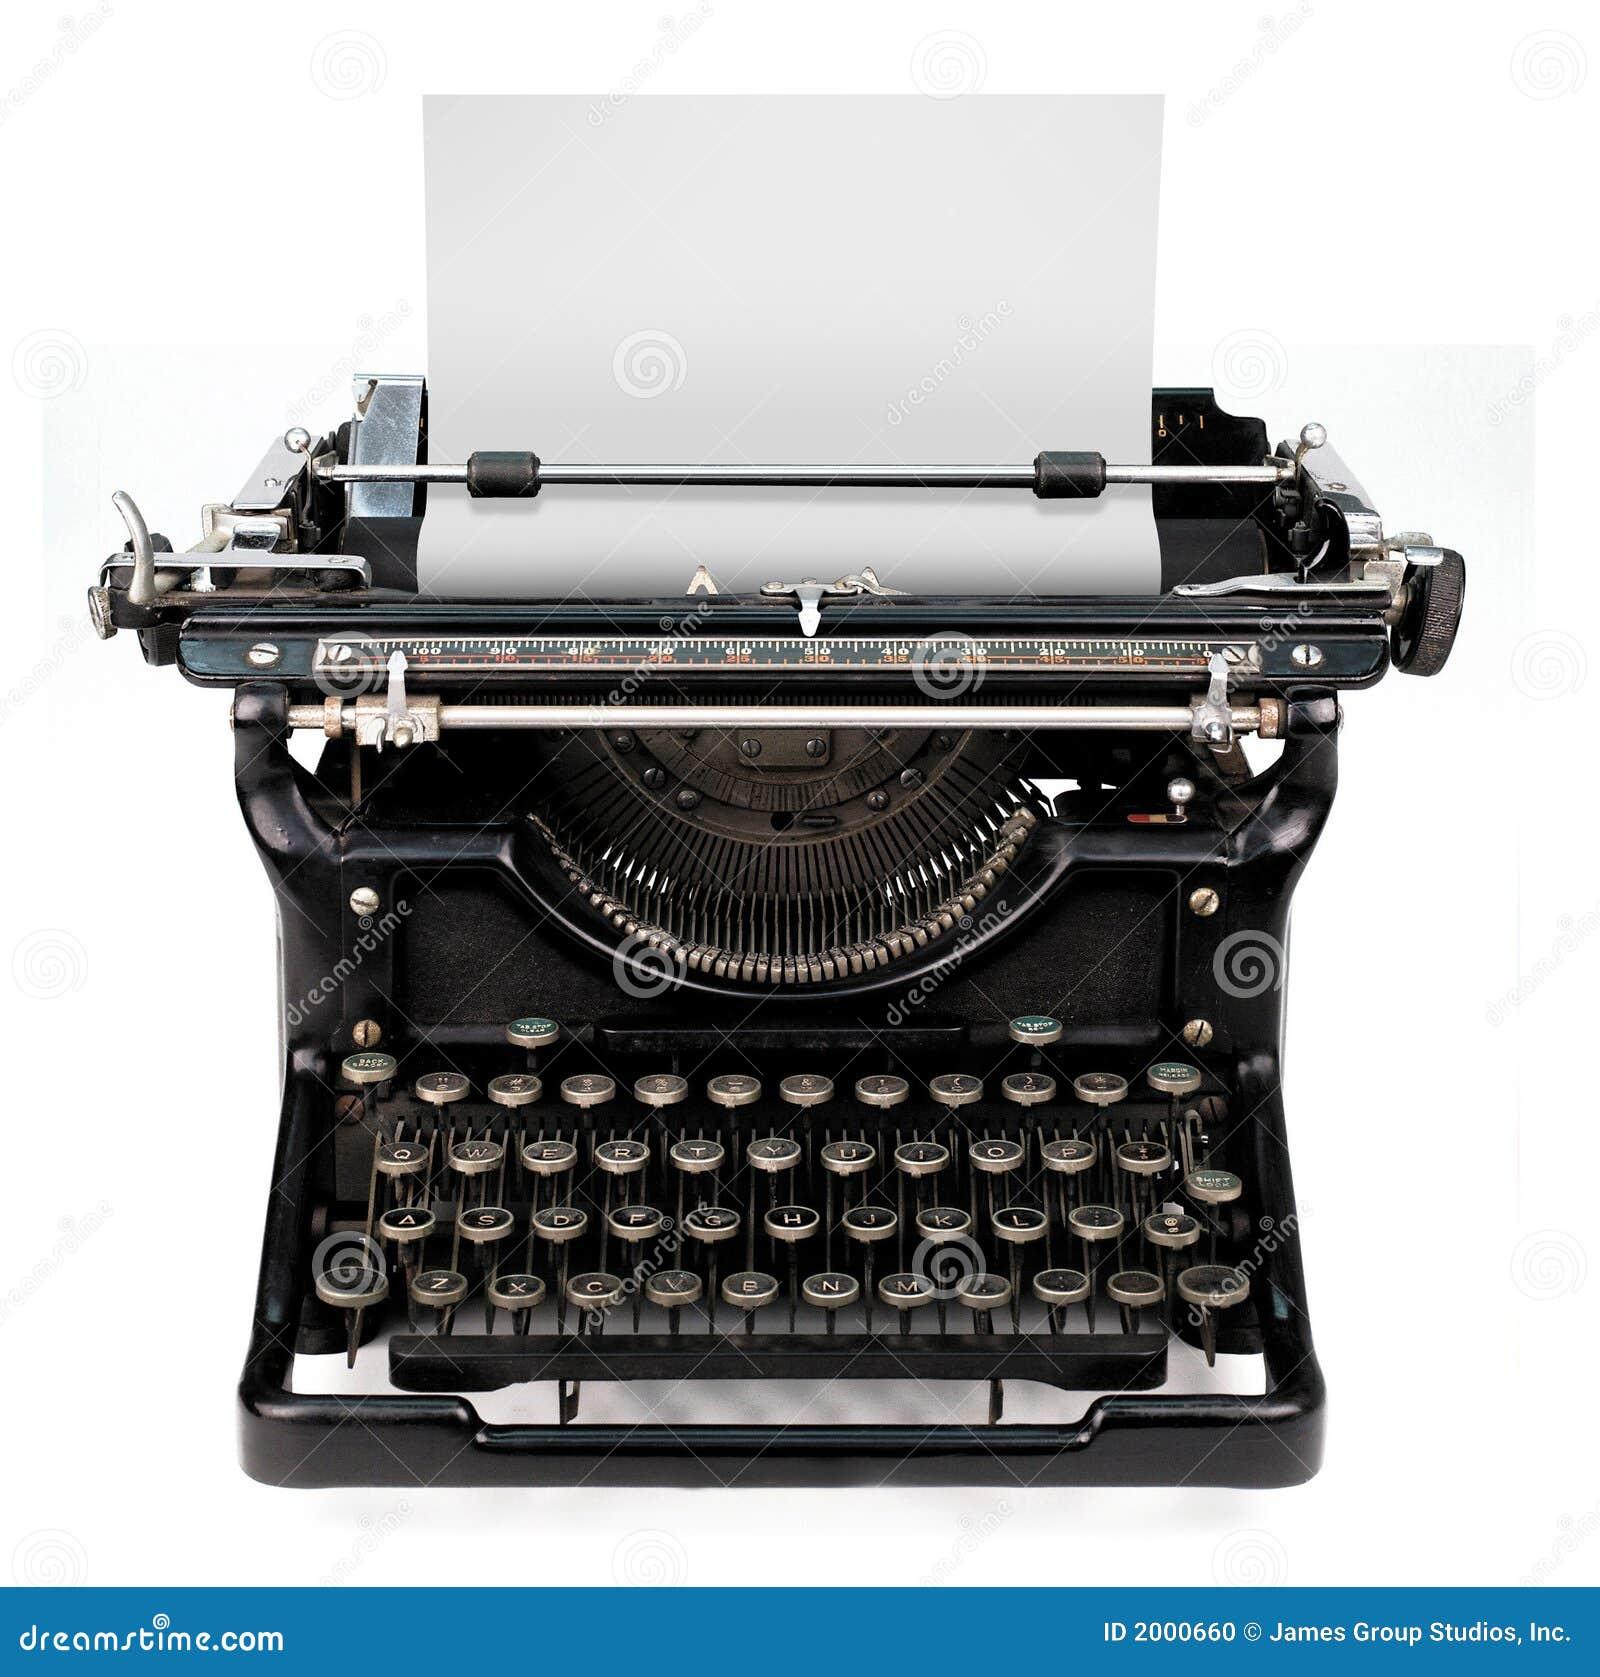 Leerbeleg in einer Schreibmaschine